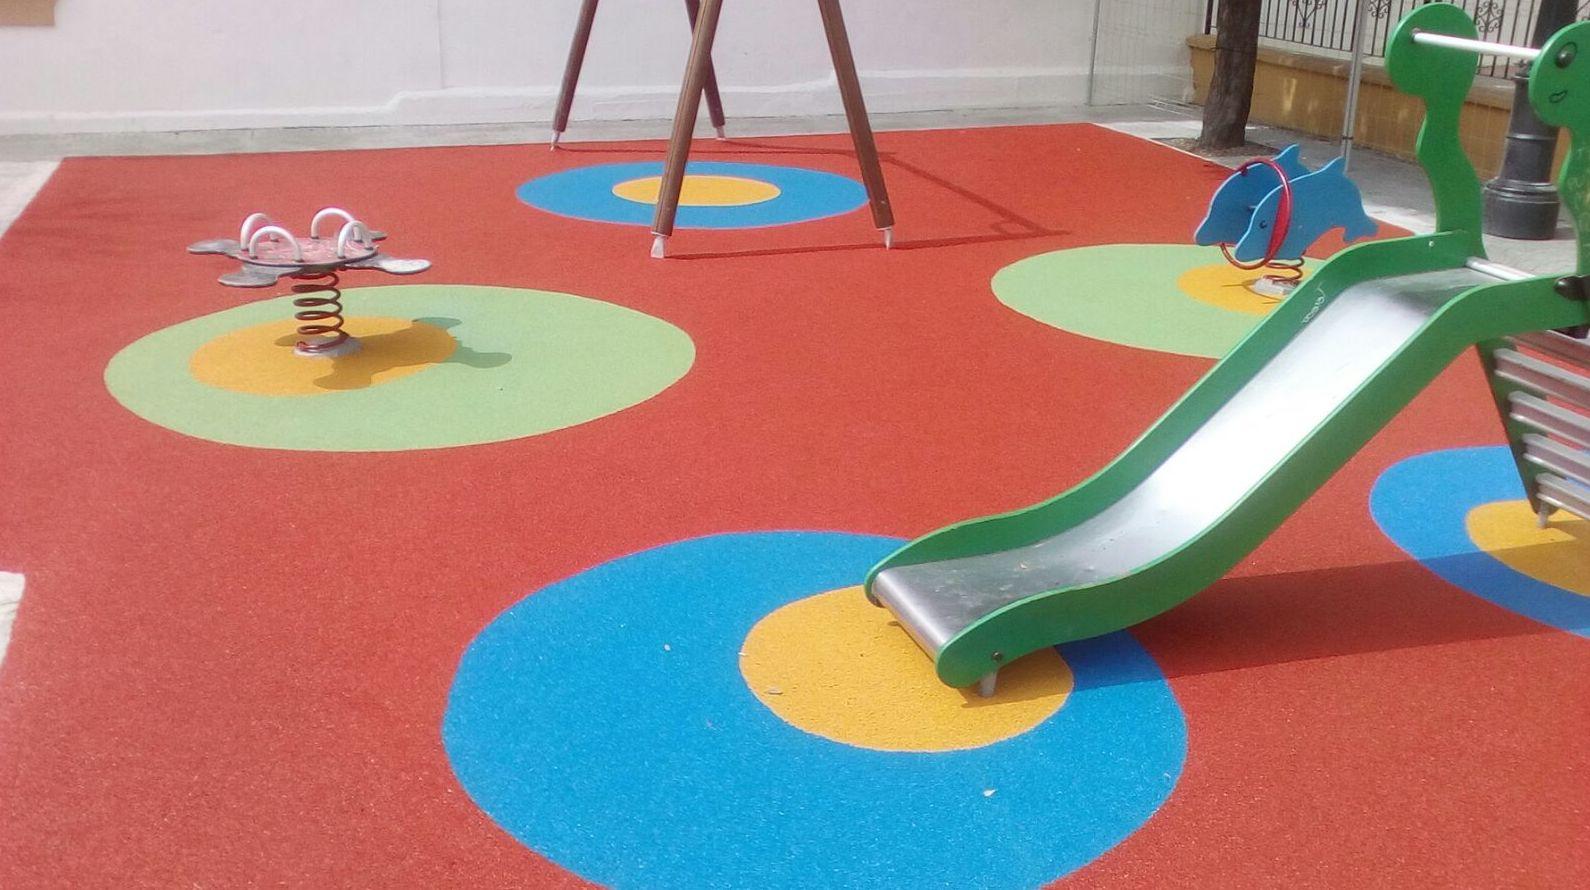 Foto 62 de Instalación de pavimentos de caucho para parques infantiles en Las Cabezas de San Juan | Pavimentos Garvel